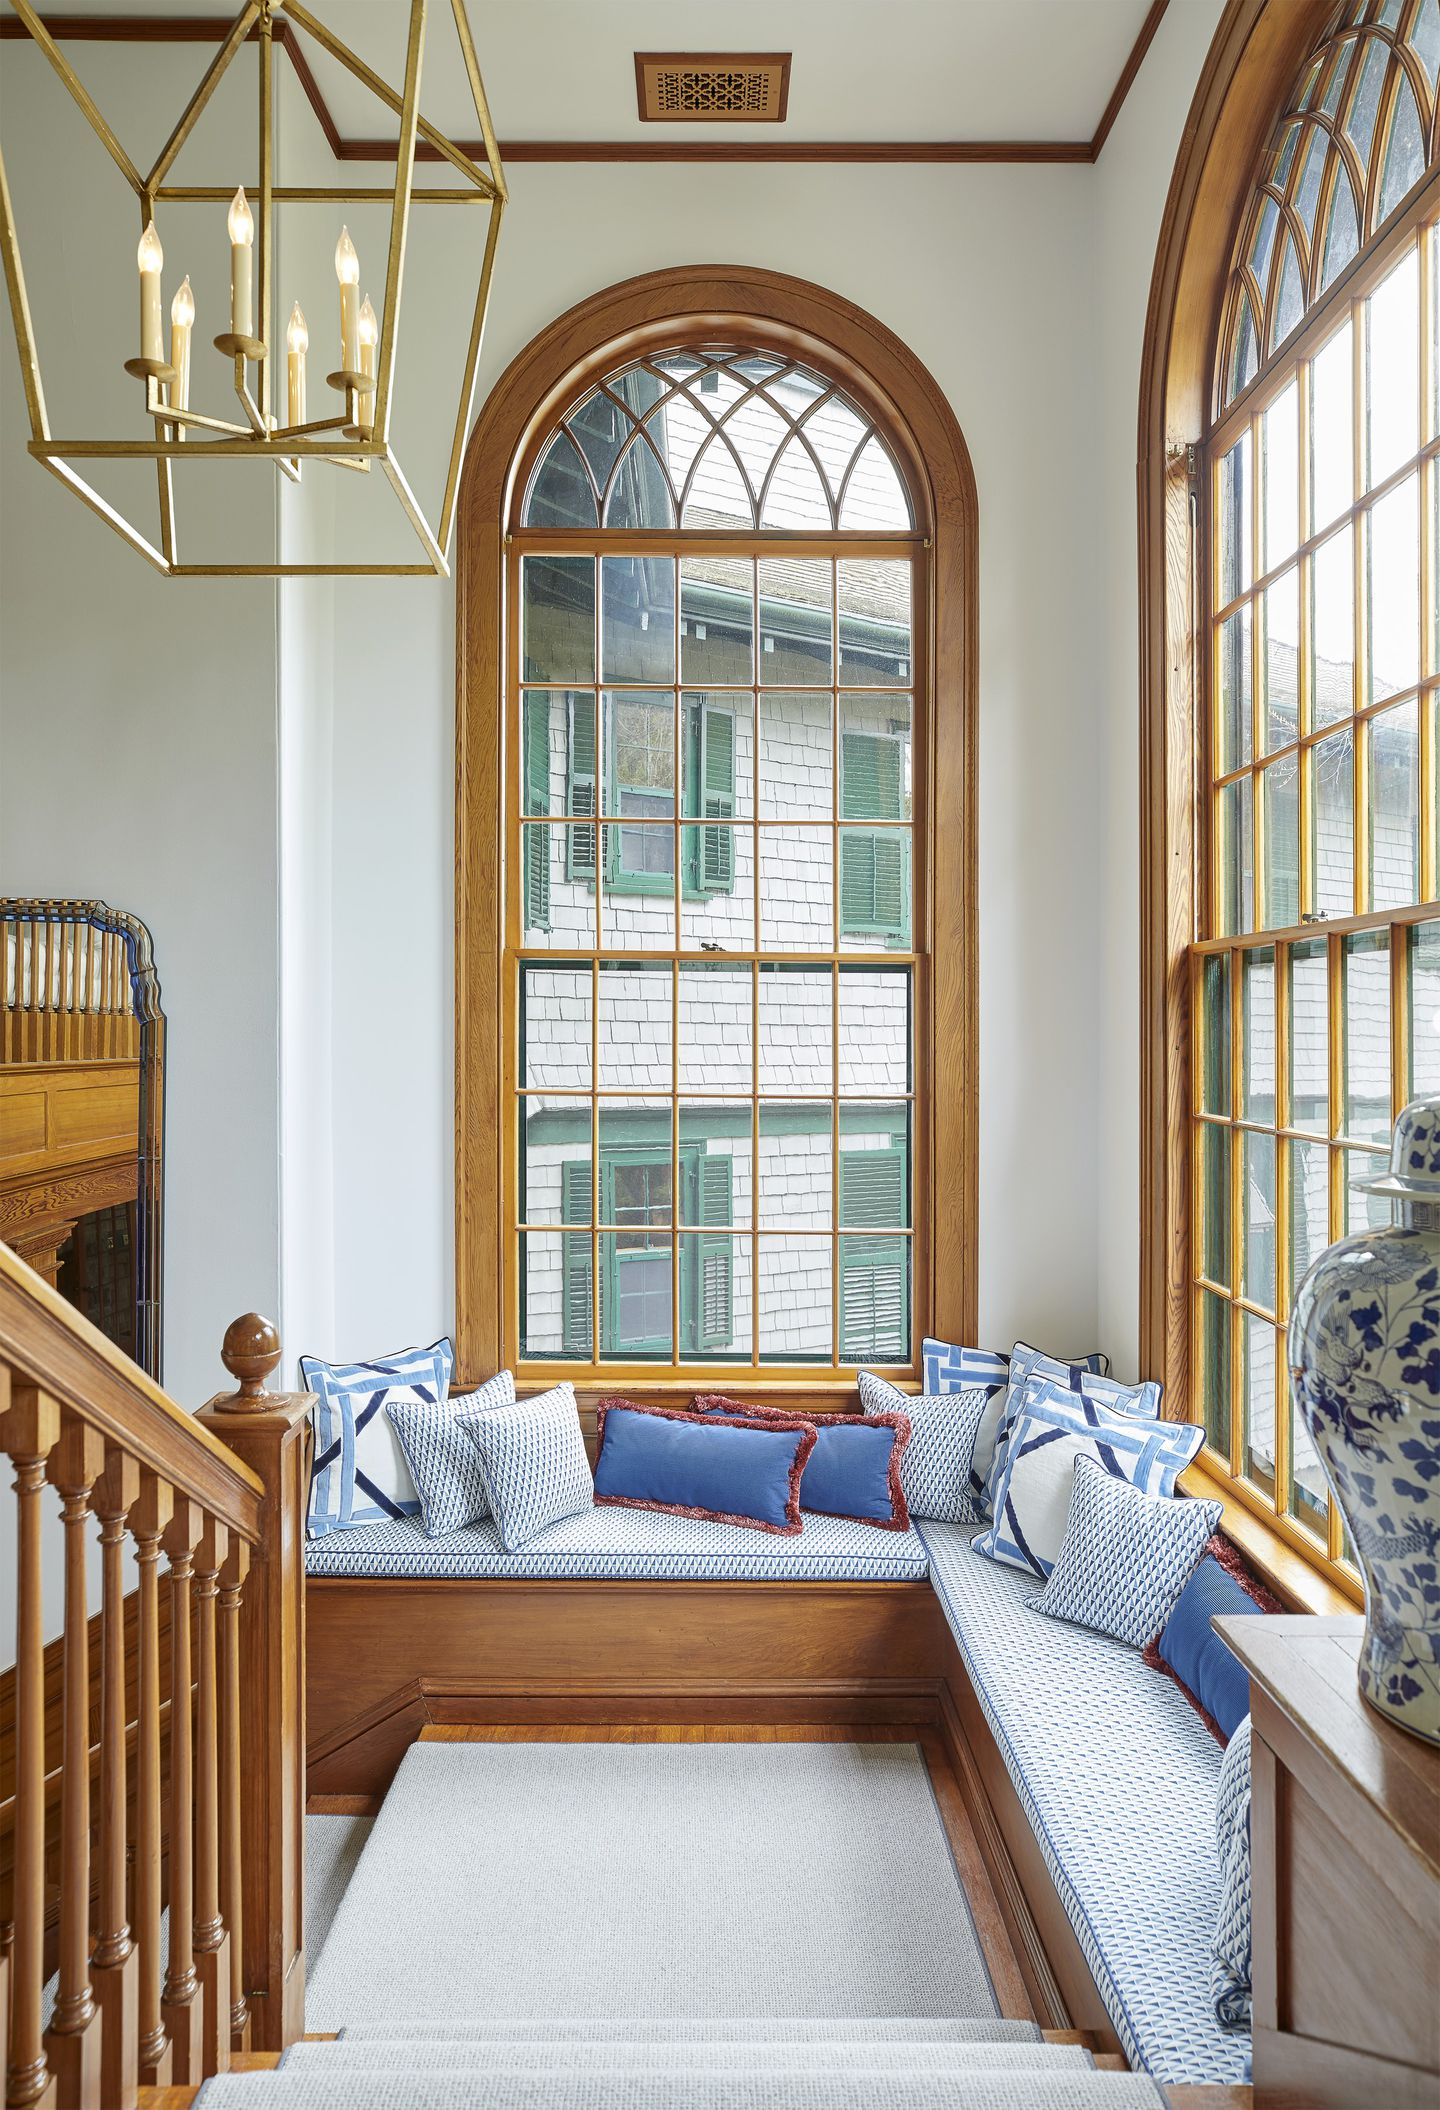 eastholm-emily-gilbert-window-seat